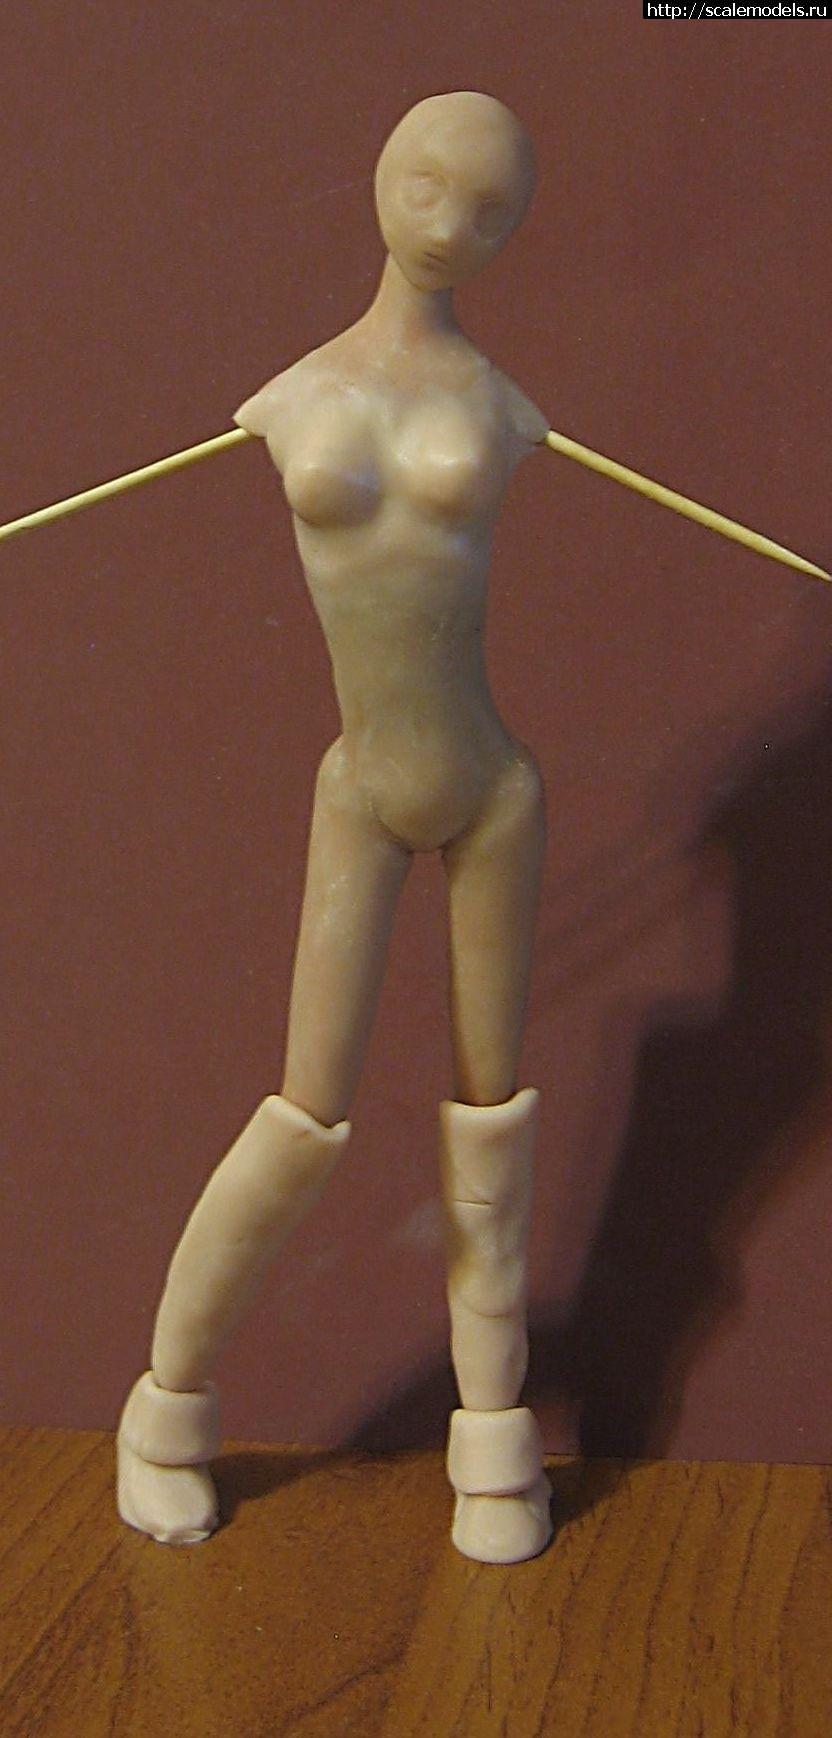 Мини статуэтки своими руками